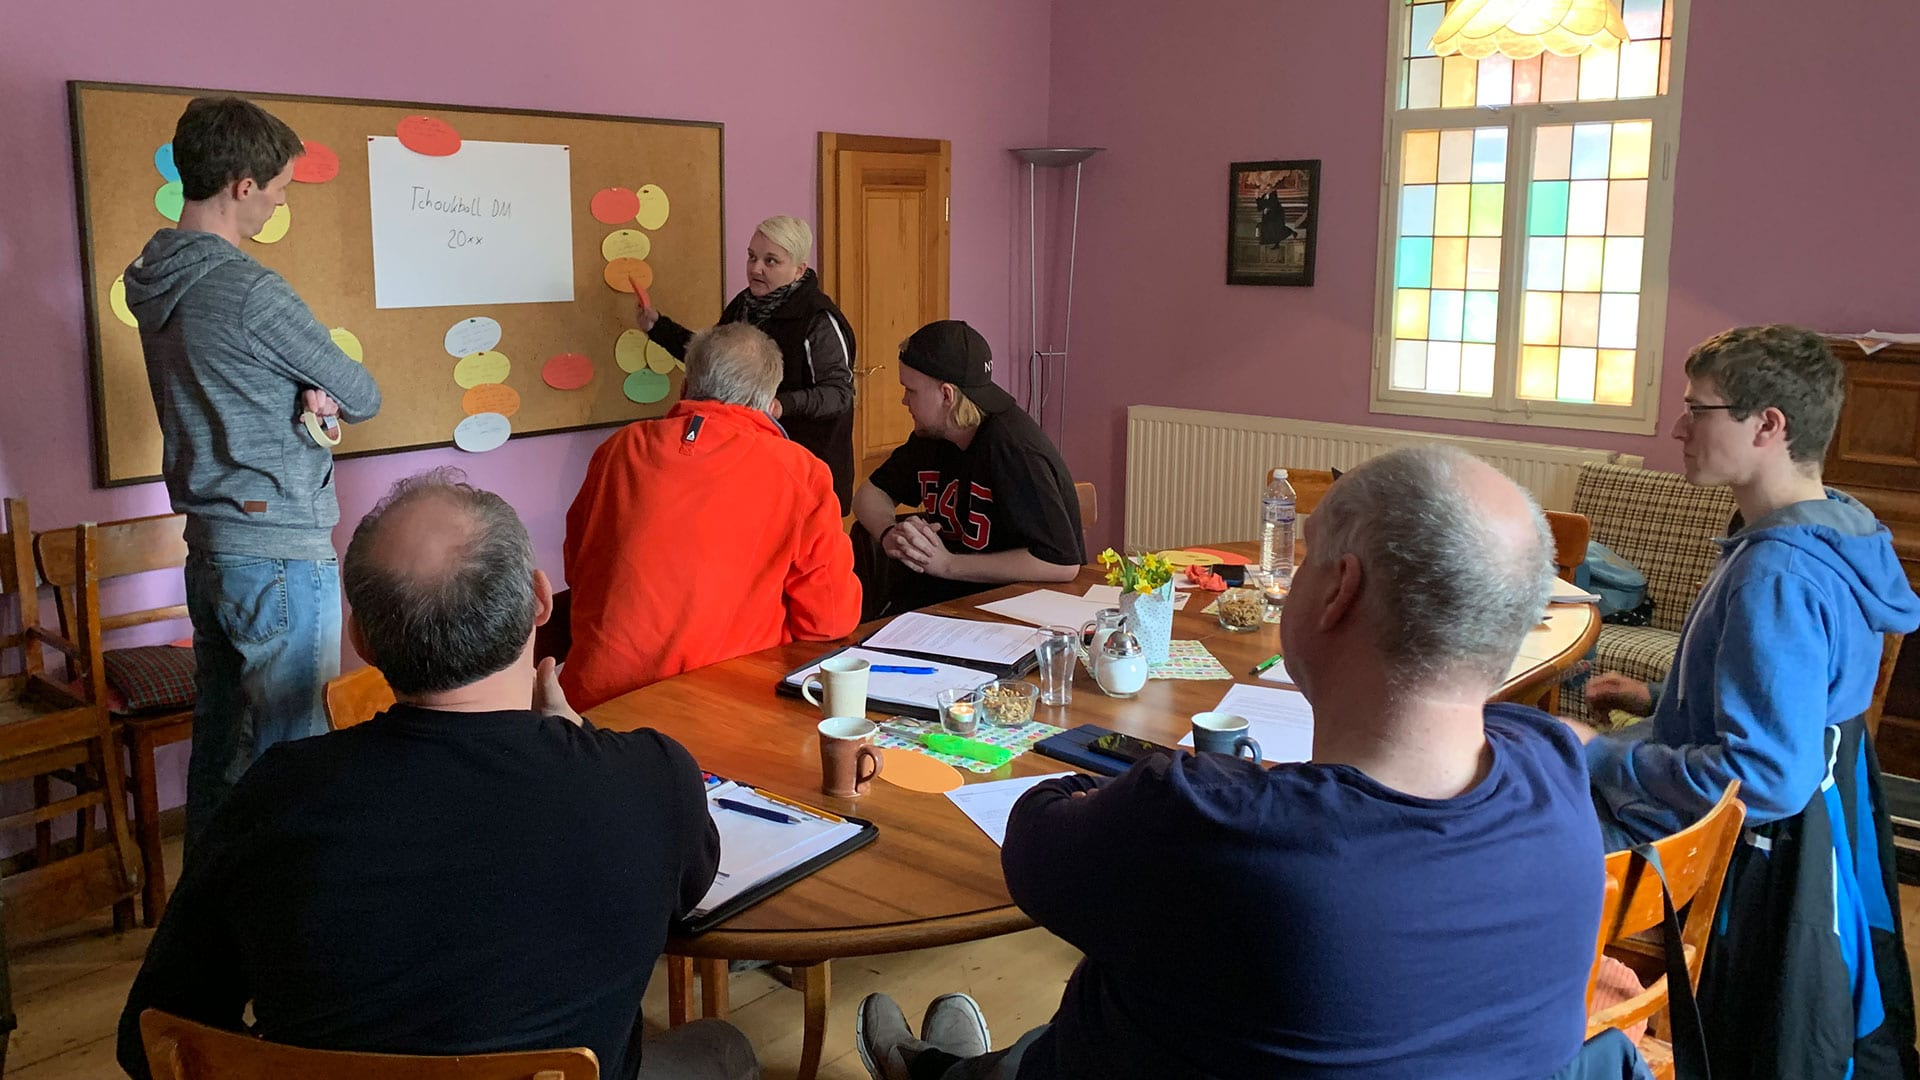 Workshop DM 20xx (Foto: Janine Pohlenz-Anhalt)